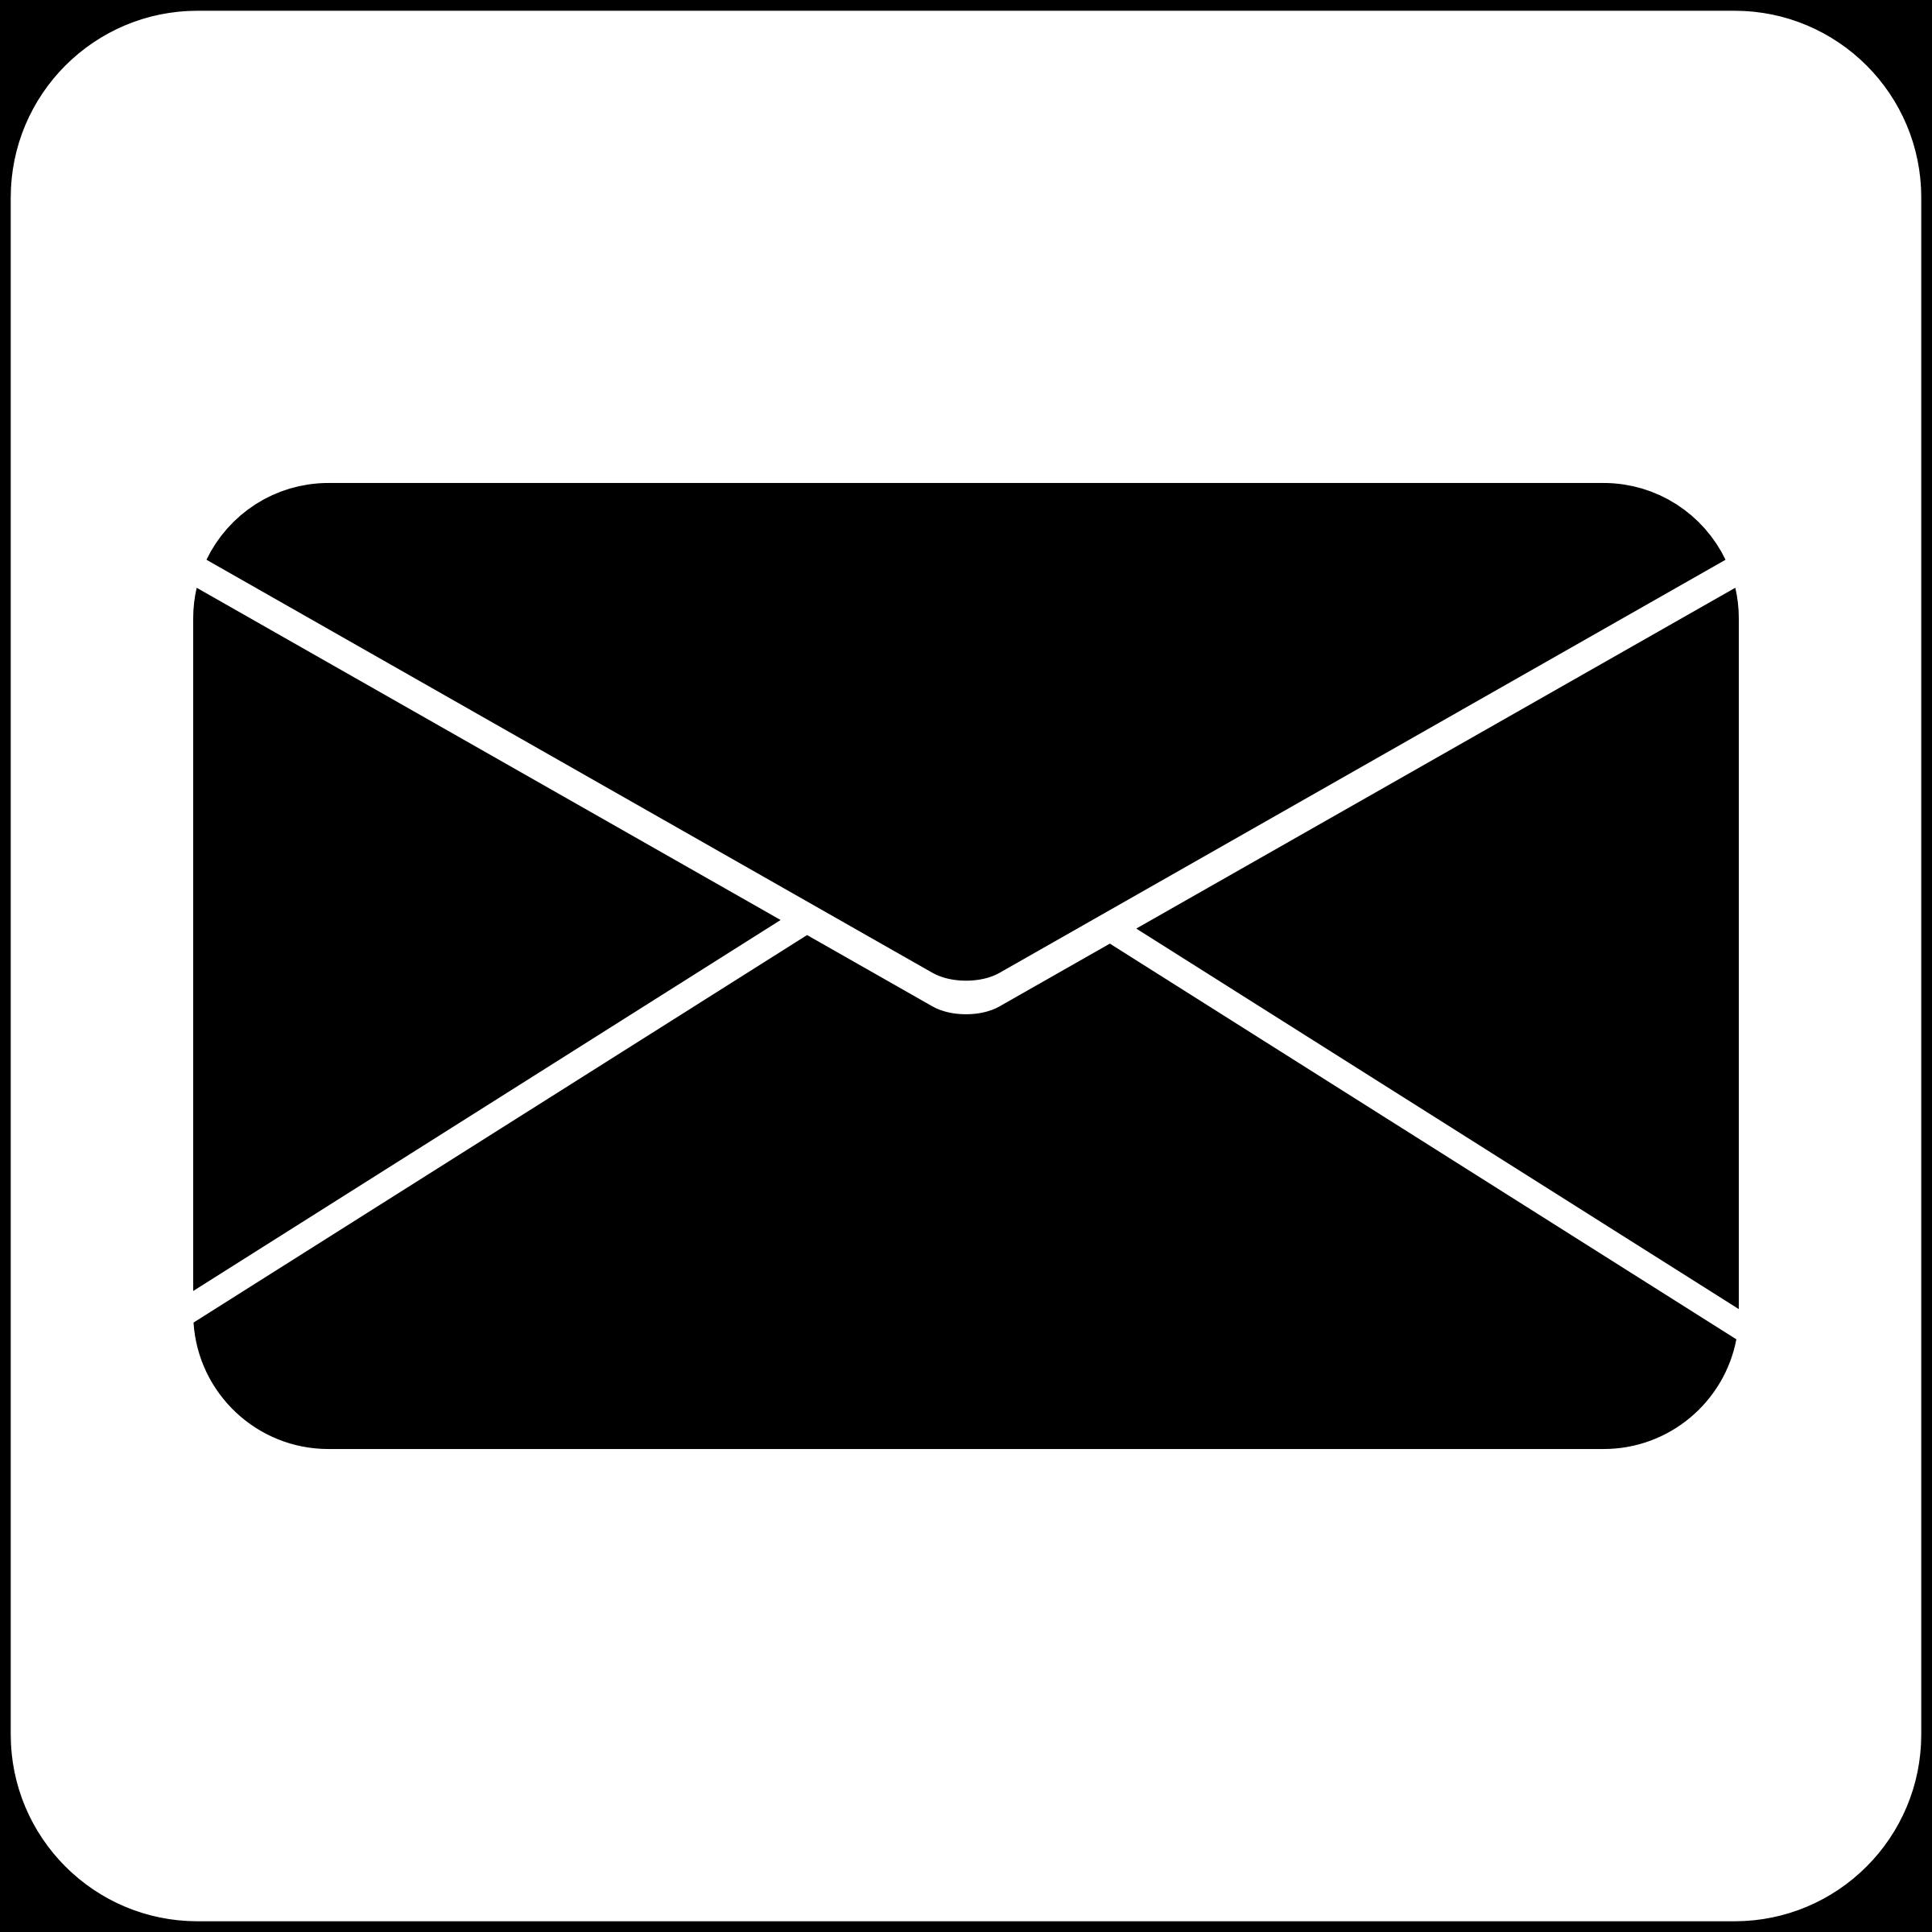 Mail Clip Art & Mail Clip Art Clip Art Images.